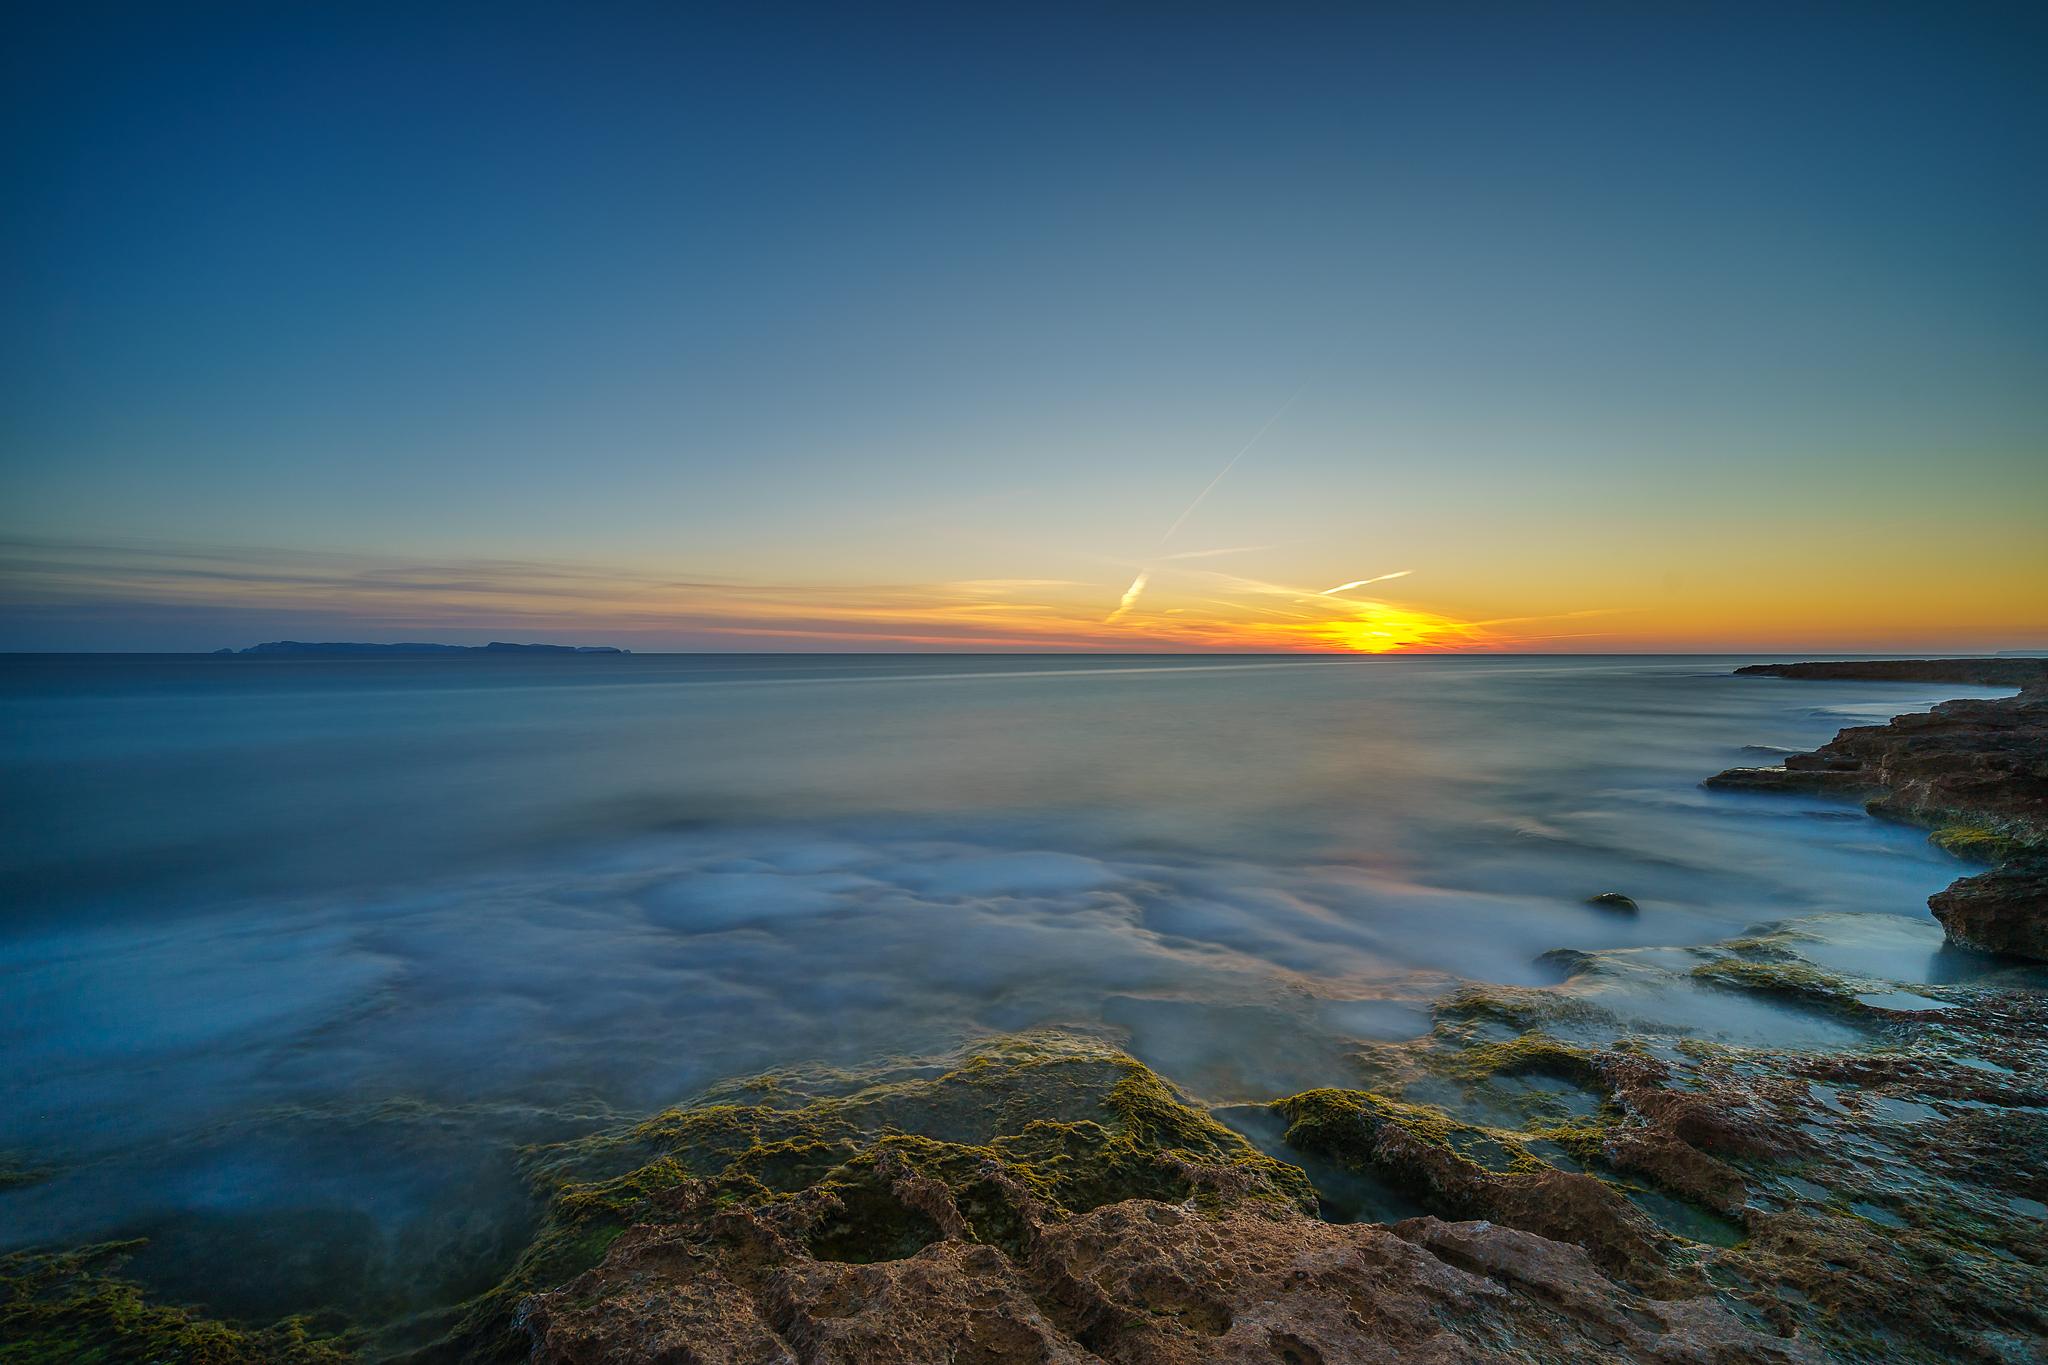 Cap de ses Salines, Spain